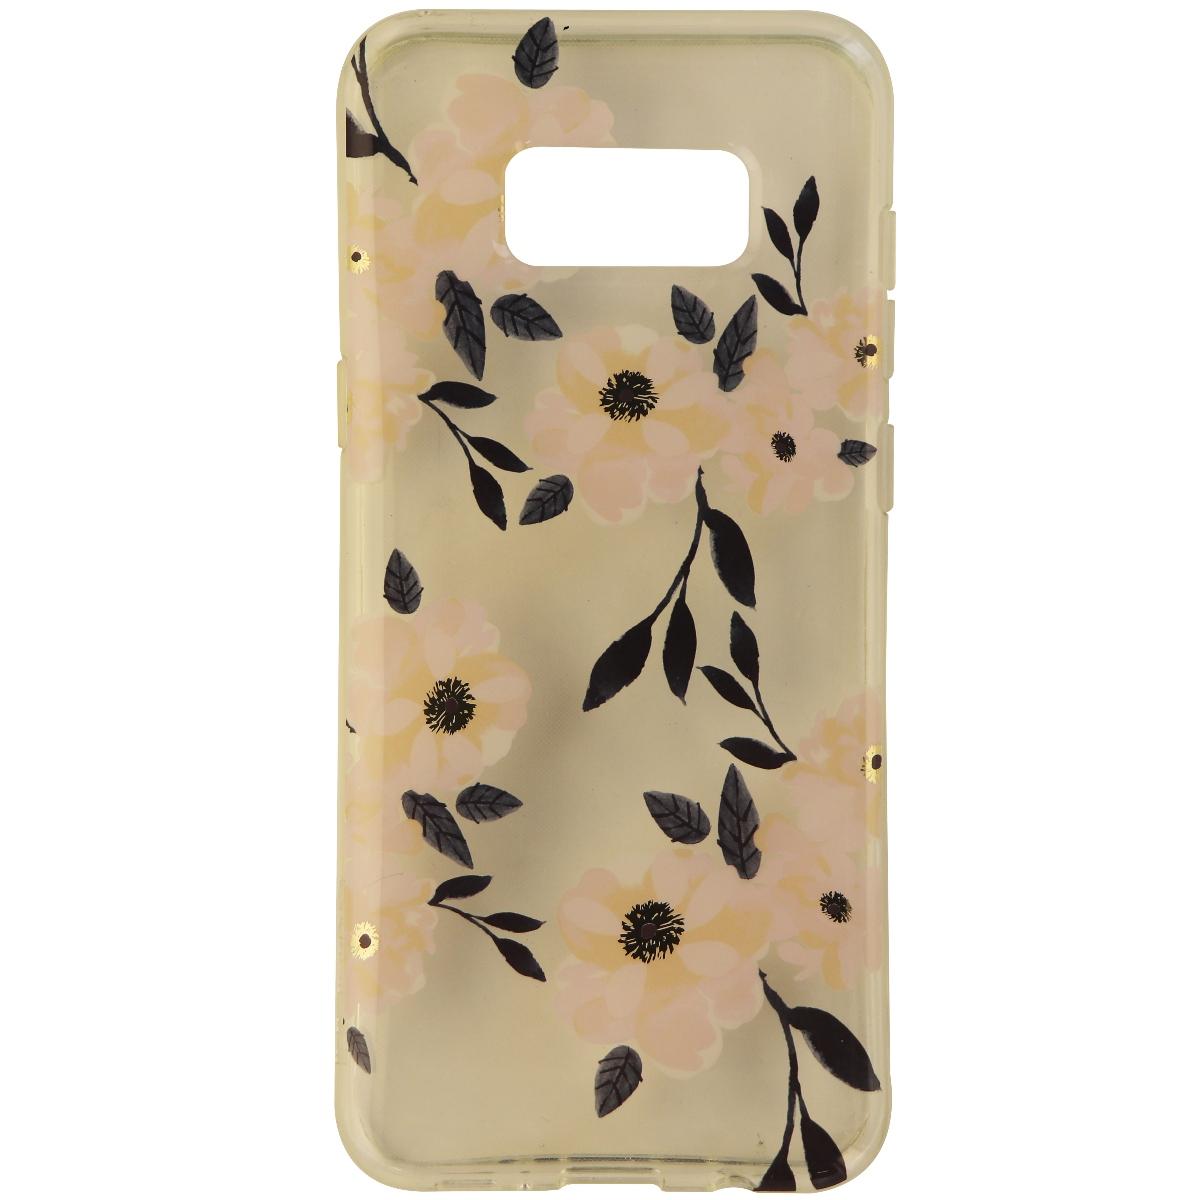 Incipio Design Series Slim Protective Case Cover for Samsung Galaxy S8+ - Flower